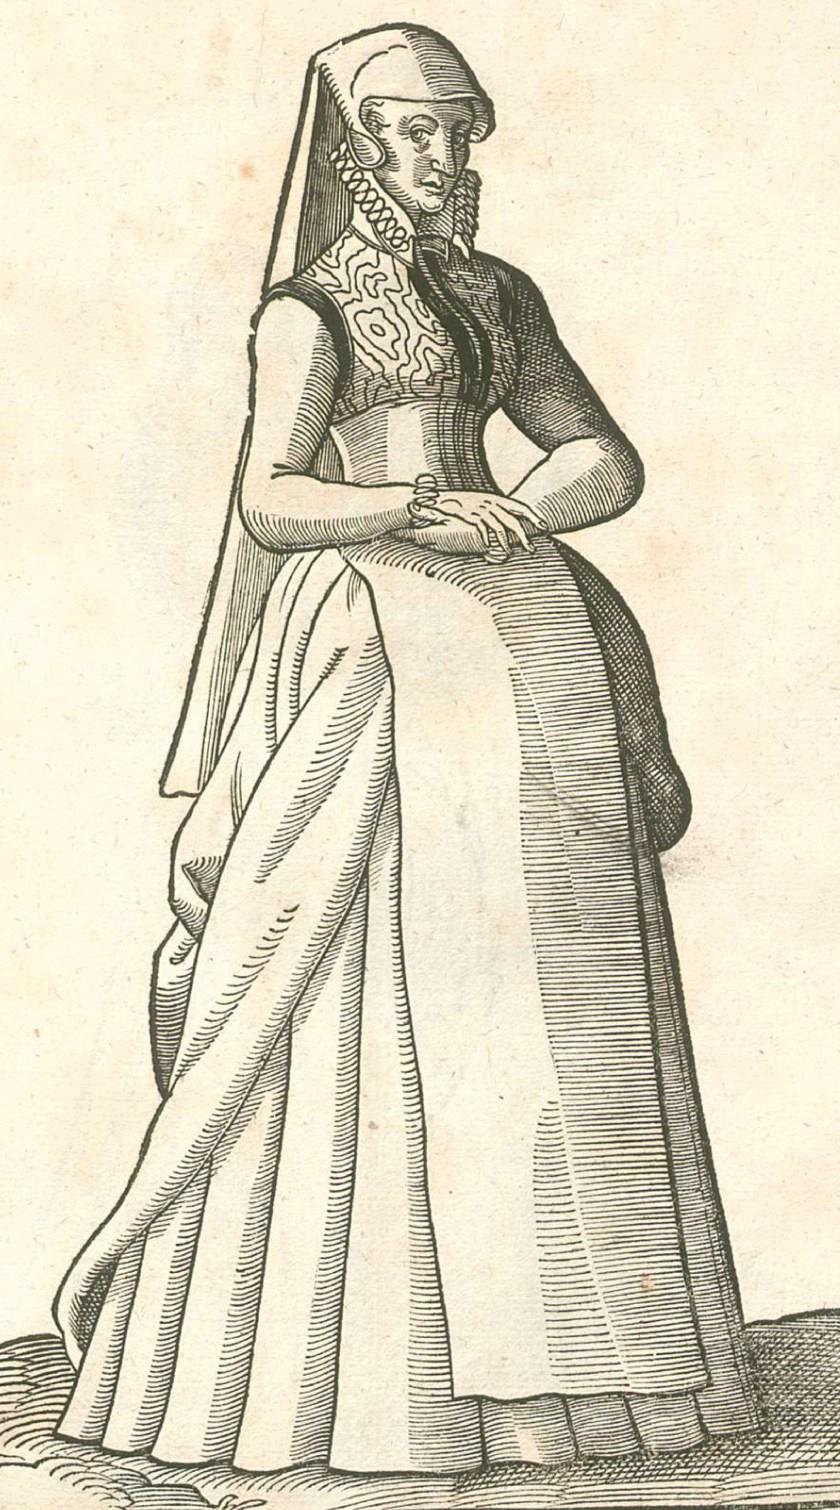 1577 Munster. LXXVIII, Habitus praecipuorum populorum, Hans Weigel. Archive.org, Bavarian State Library